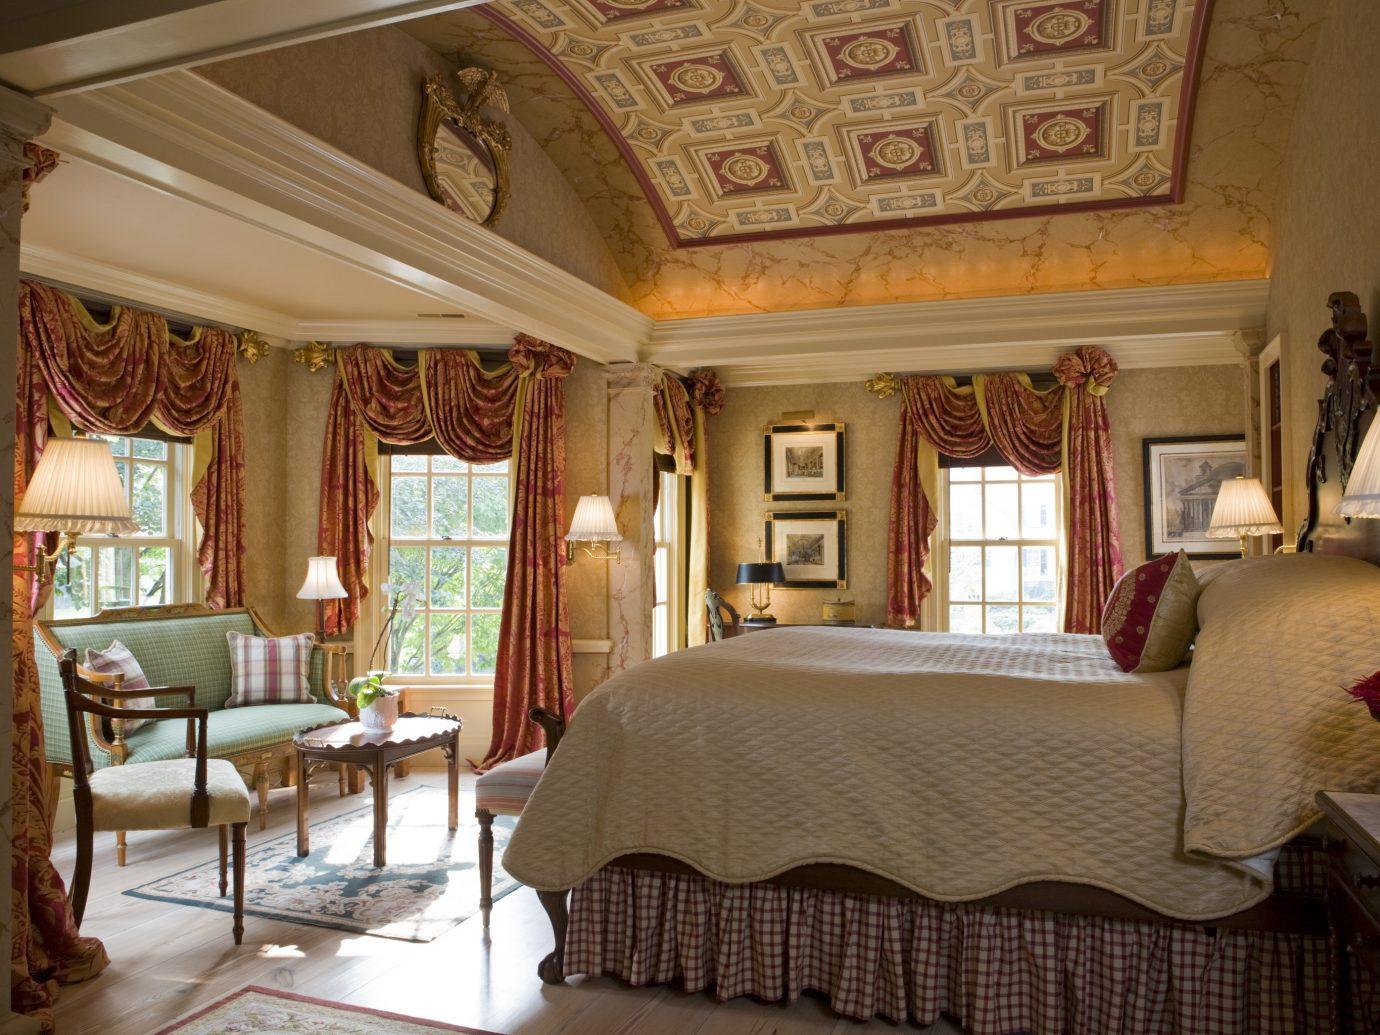 Hotels indoor room wall floor property estate living room Suite home mansion interior design cottage Villa real estate Bedroom Resort farmhouse area decorated furniture